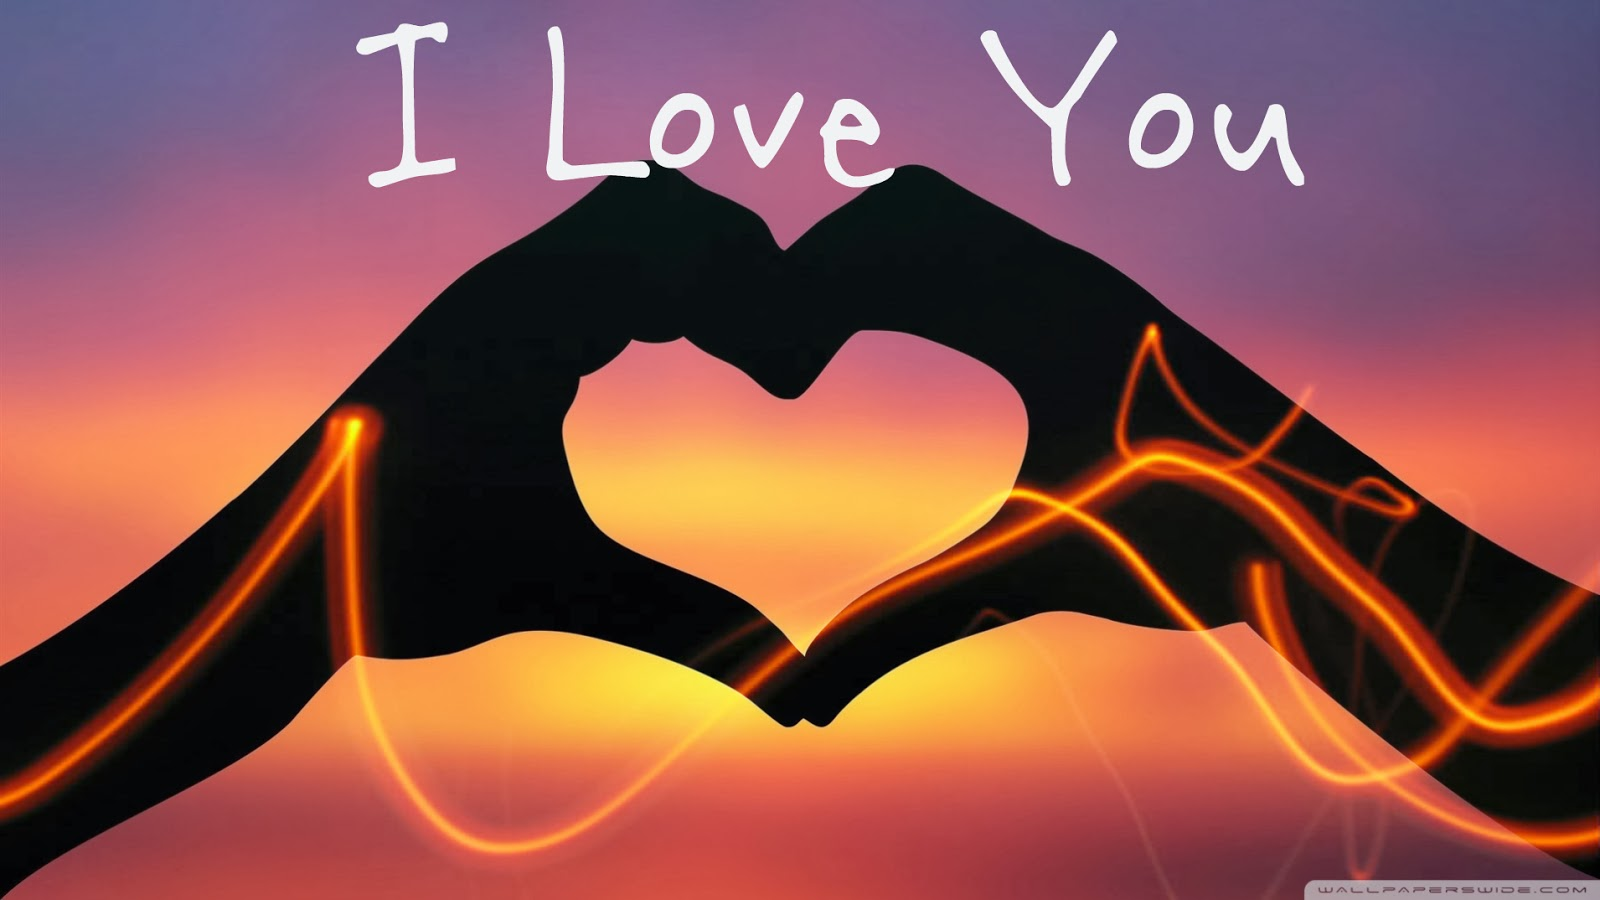 I love you image 93756 wallpaper